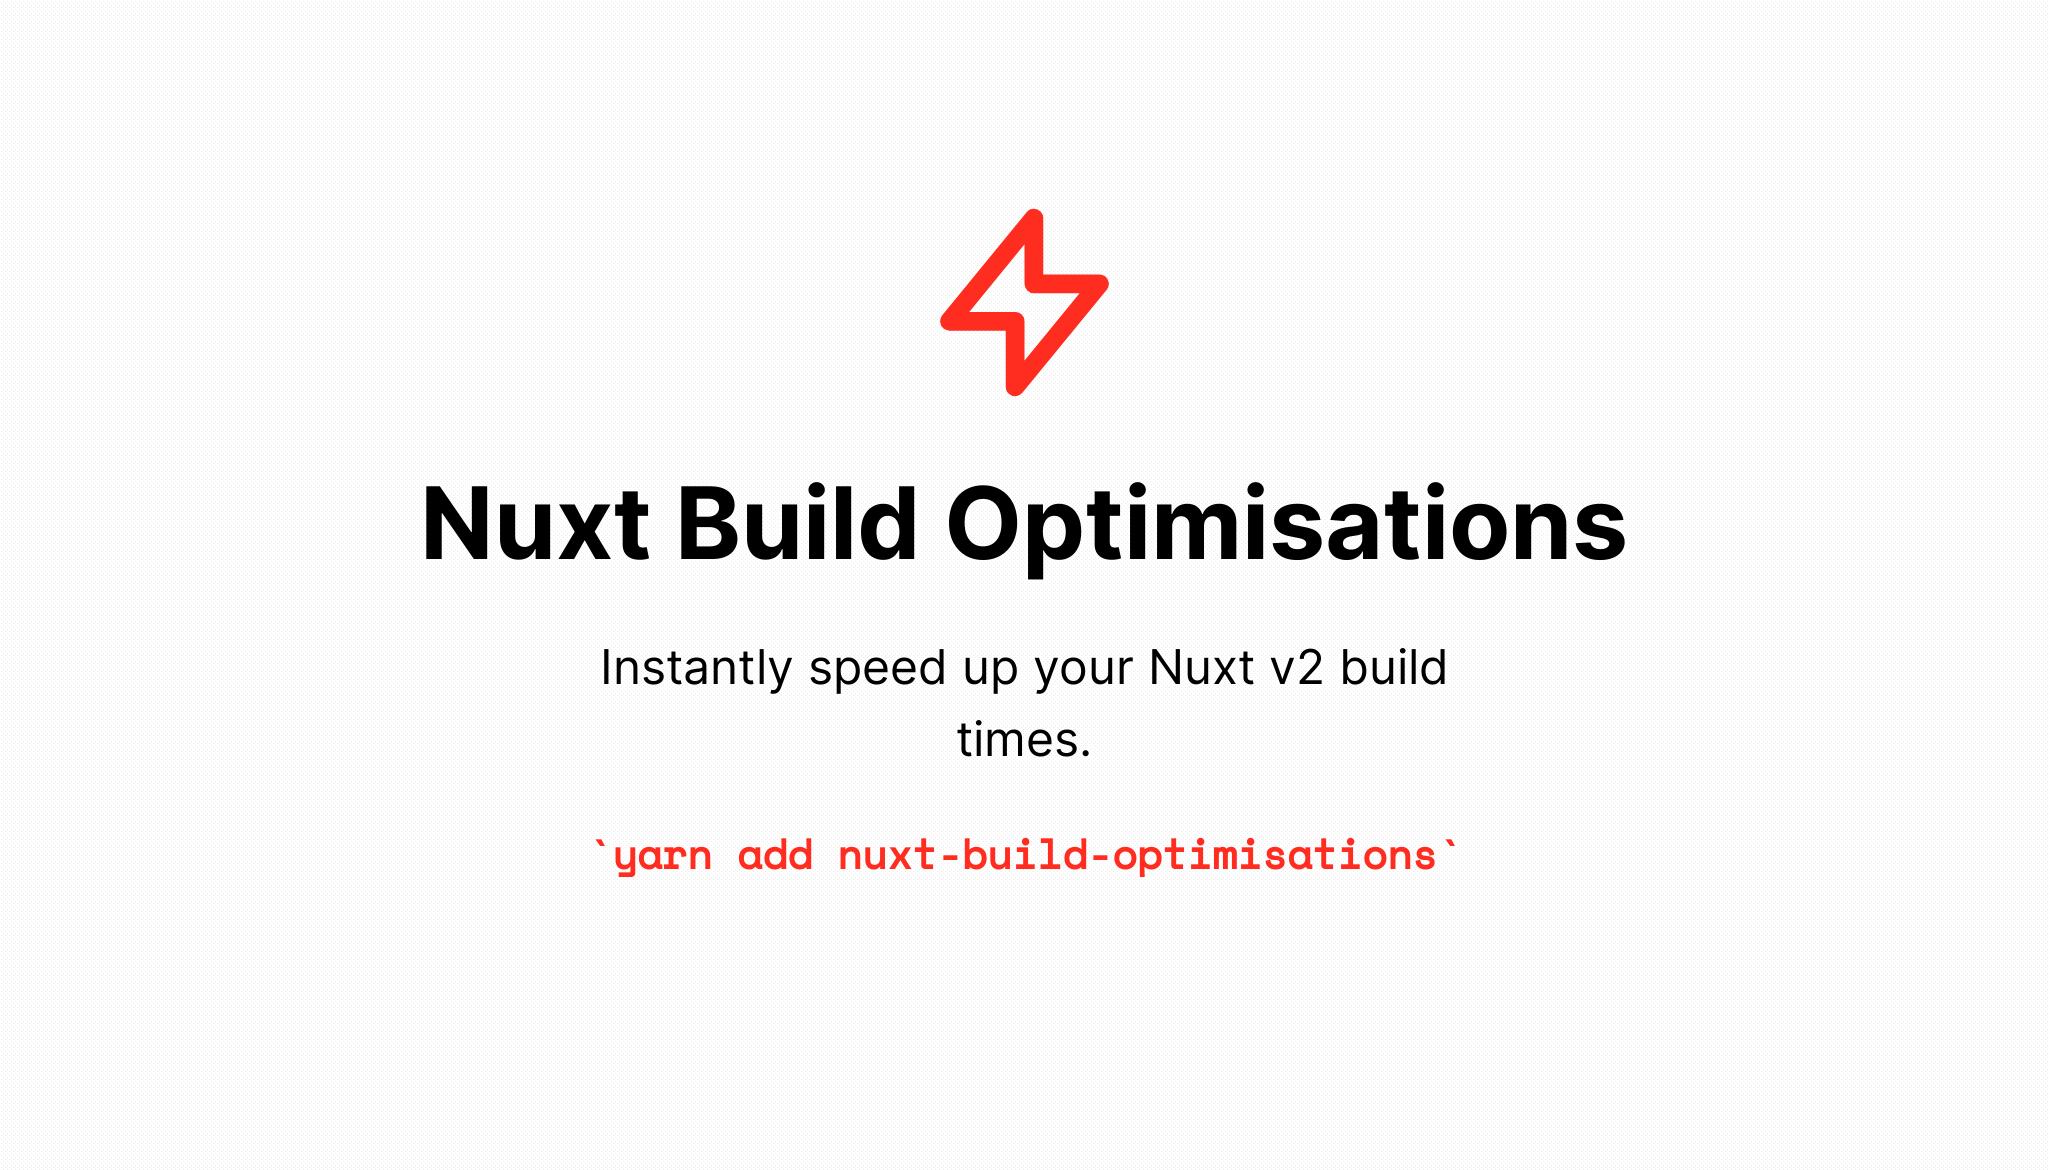 nuxt 加快编译速度